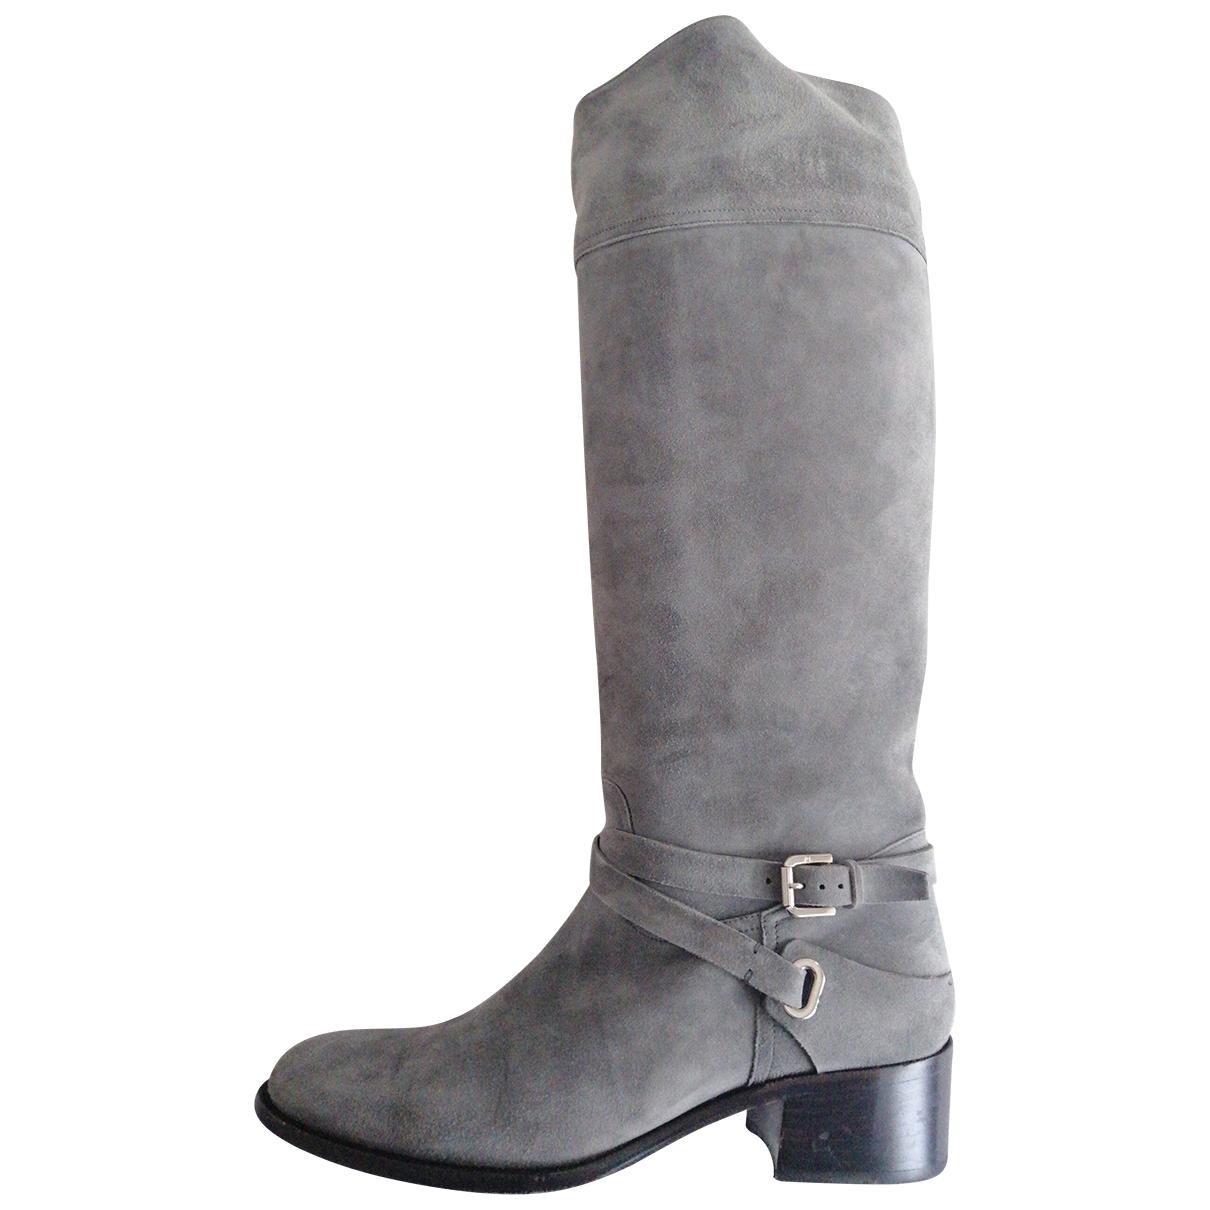 Ralph Lauren Collection \N Grey Suede Boots for Women 9.5 US